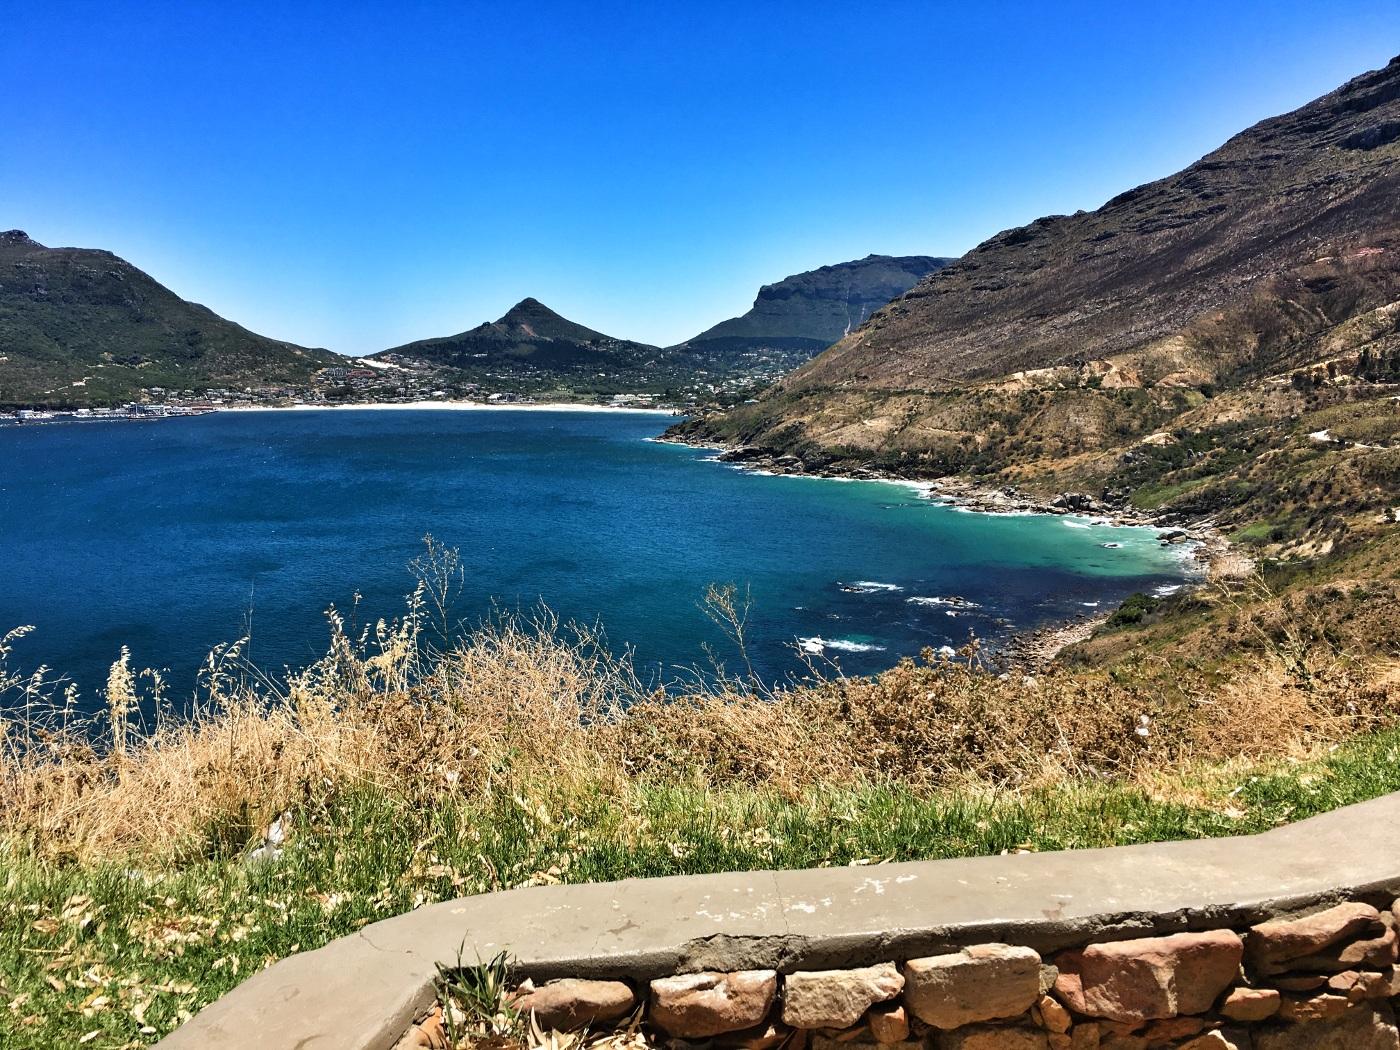 Chapman's peak in Cape Town